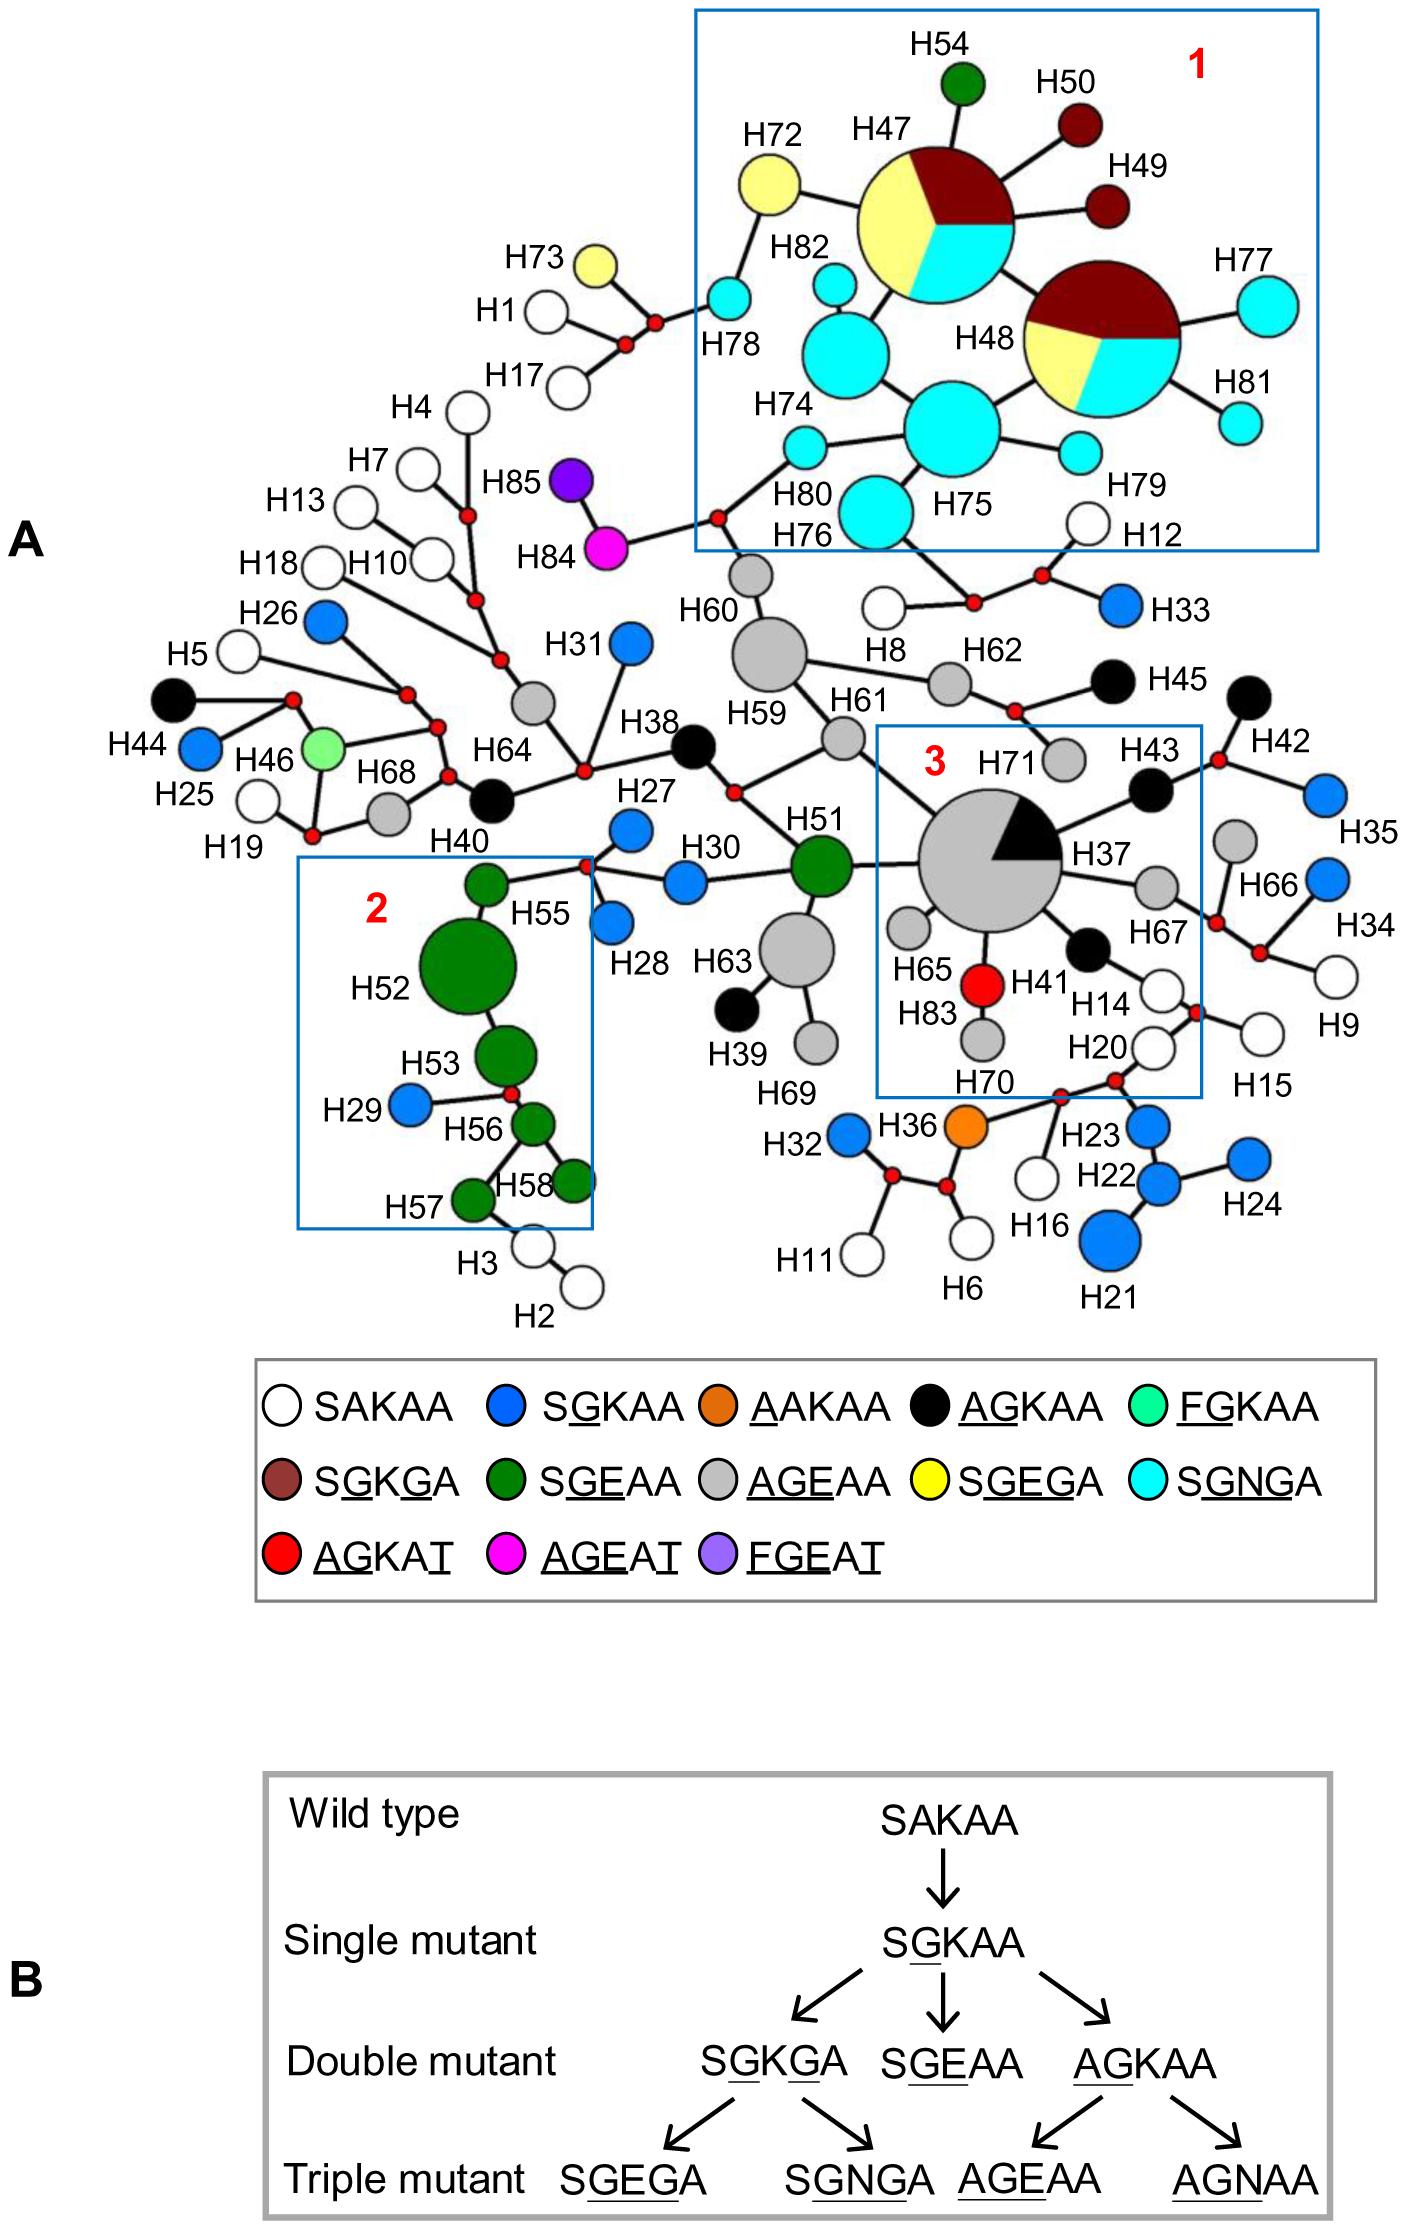 Genetic relationships among <i>dhps</i> alleles in Cambodia.